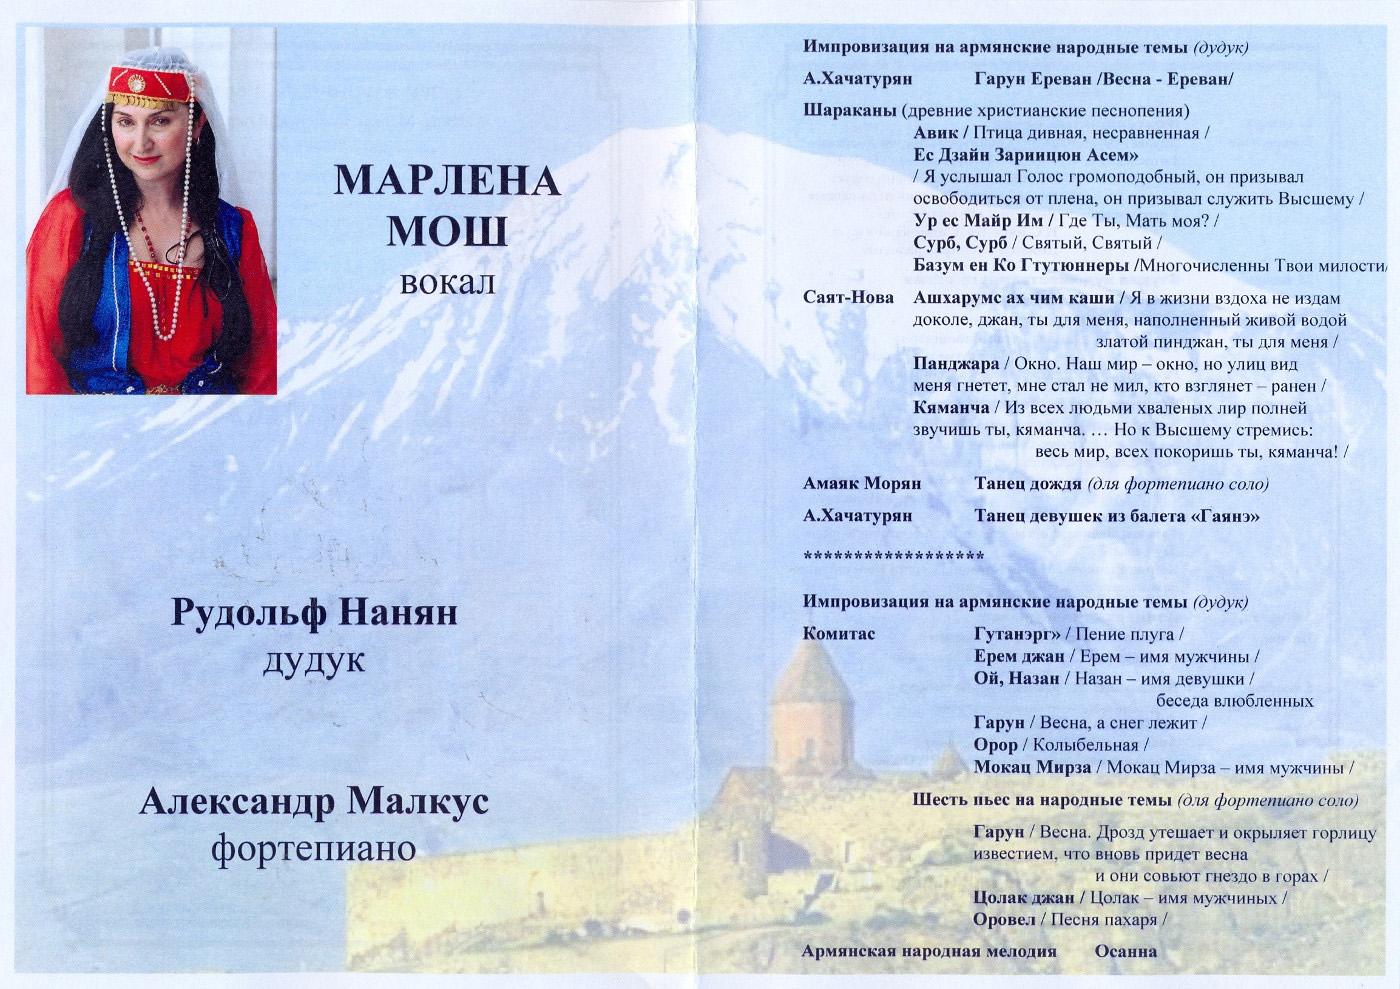 Концерт Марлены Мош